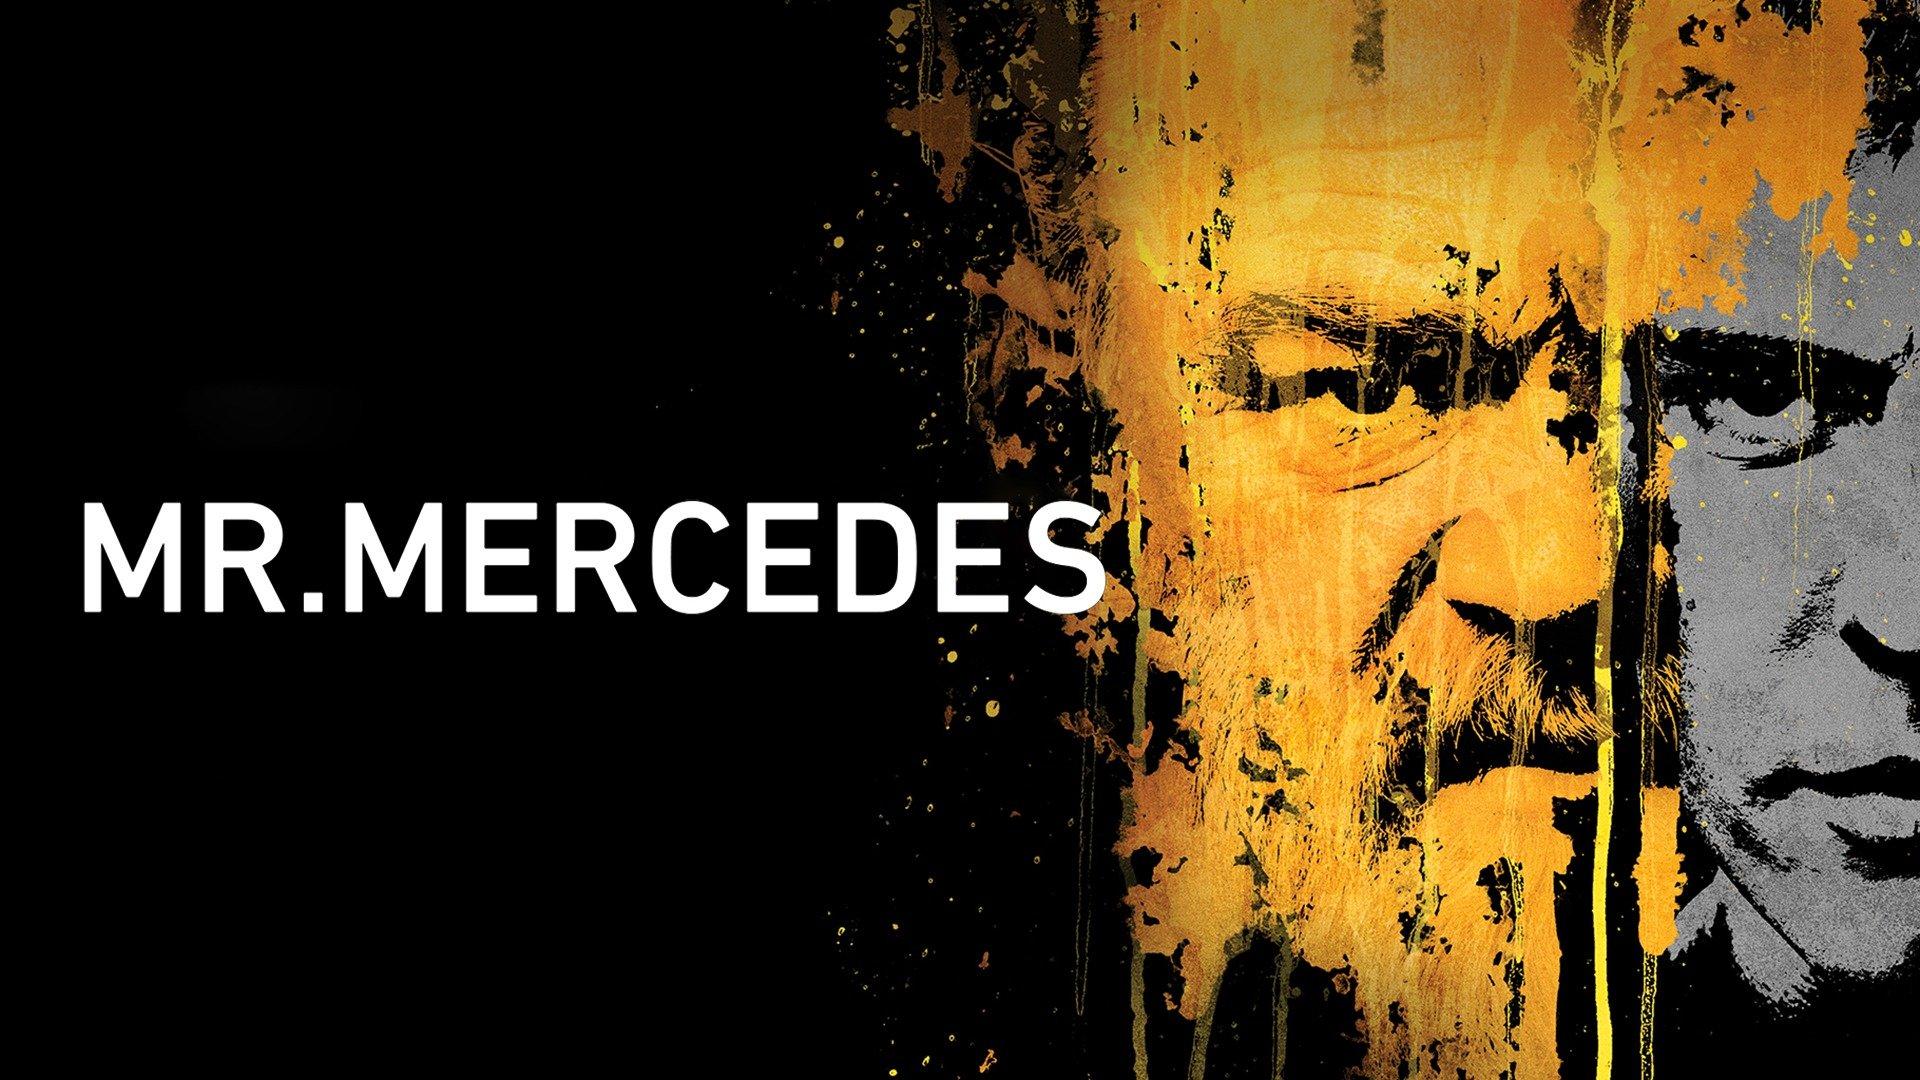 [News] Bruce Dern to Guest Star on MR. MERCEDES